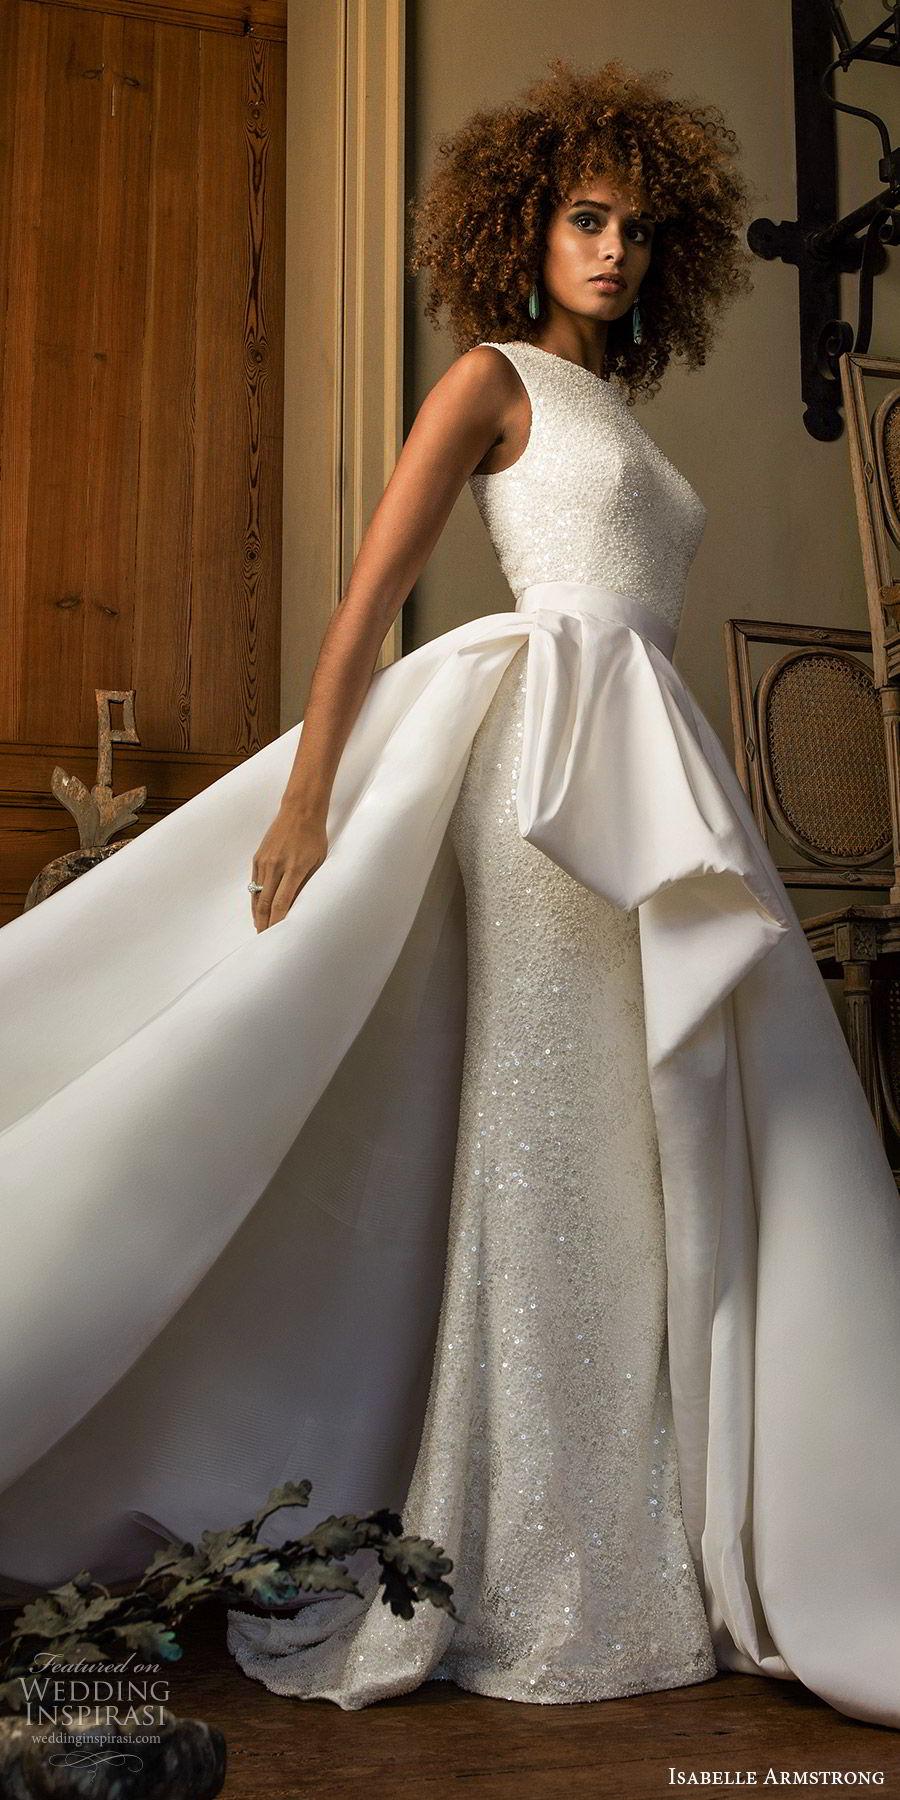 isabelle armstrong fall 2019 bridal sleeveless jewel neckline fully embellished fit flare sheath wedding dress ball gown overskirt (7) modern elegant sv